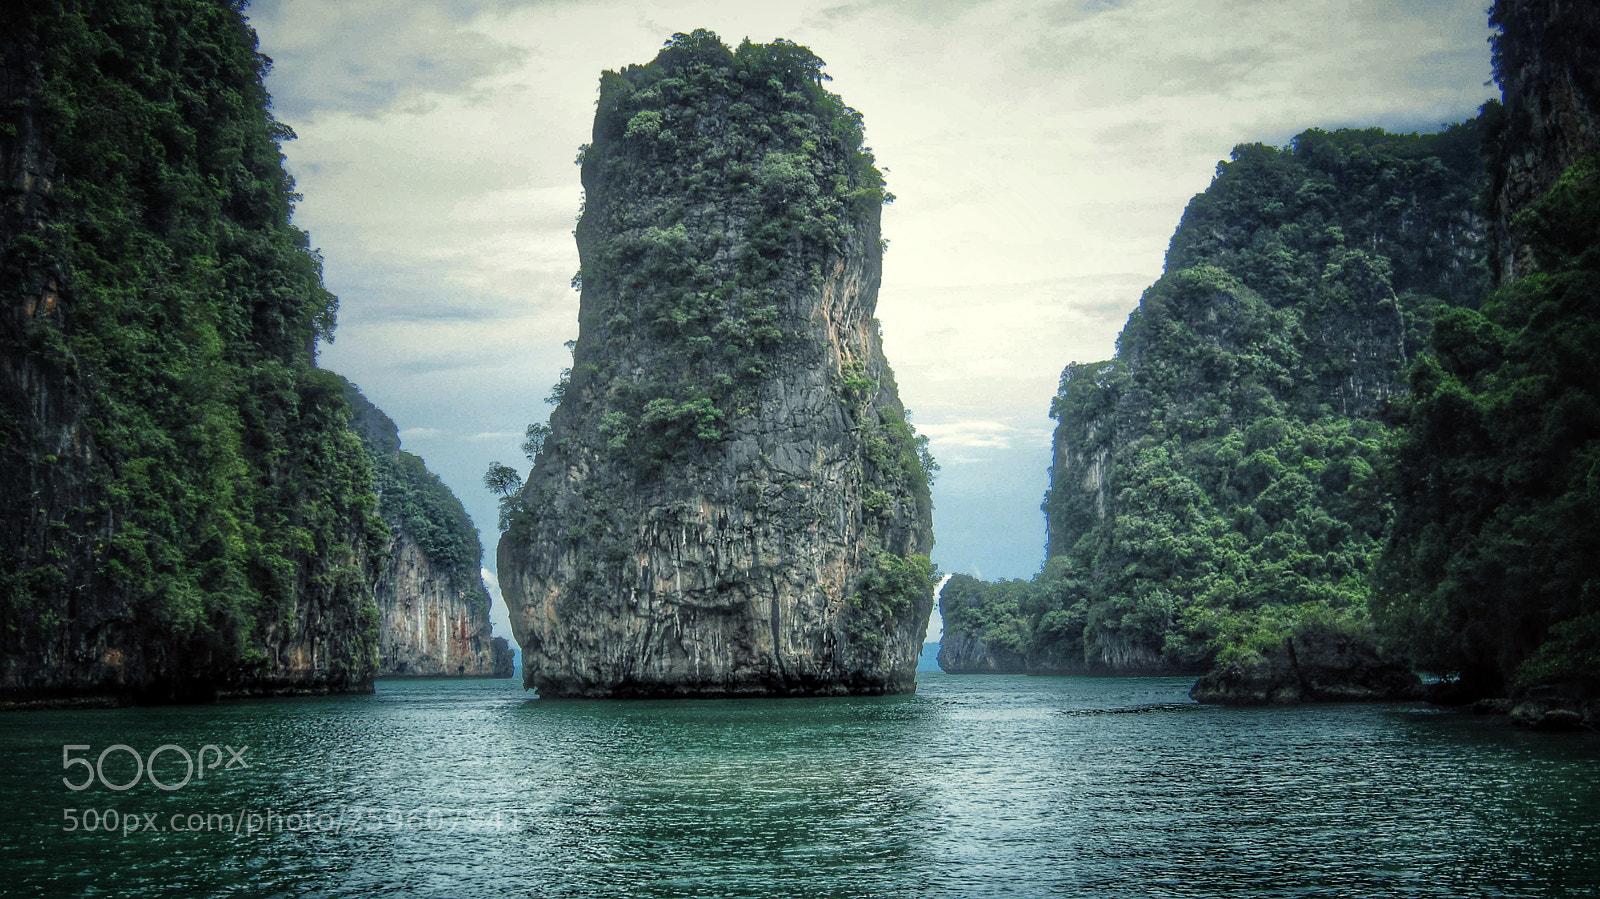 Thailand, Canon DIGITAL IXUS 200 IS